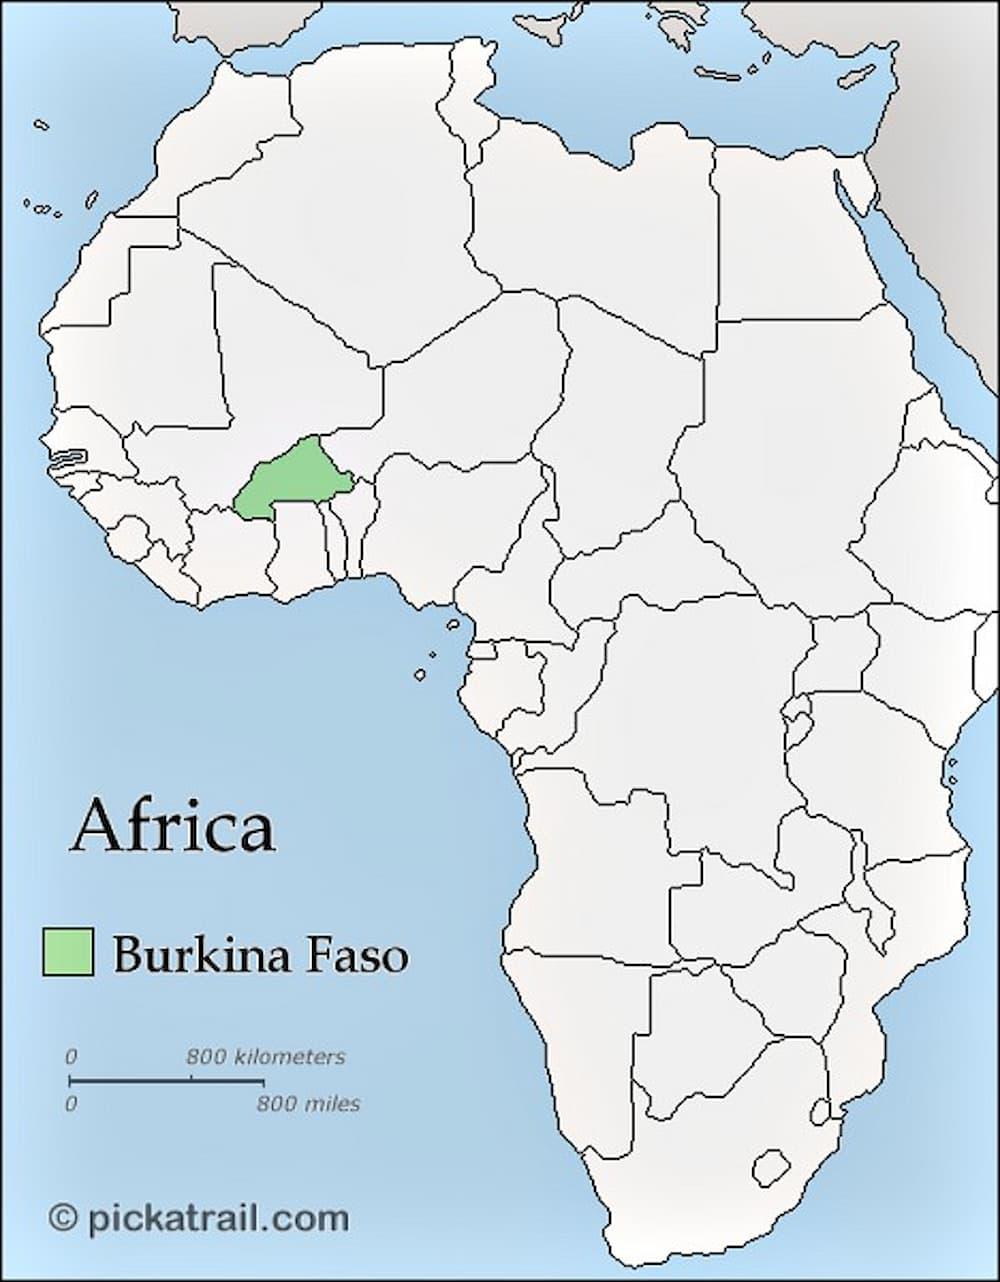 Burkina Faso The Heart Of West Africa Backpacker Travel - Burkina faso map